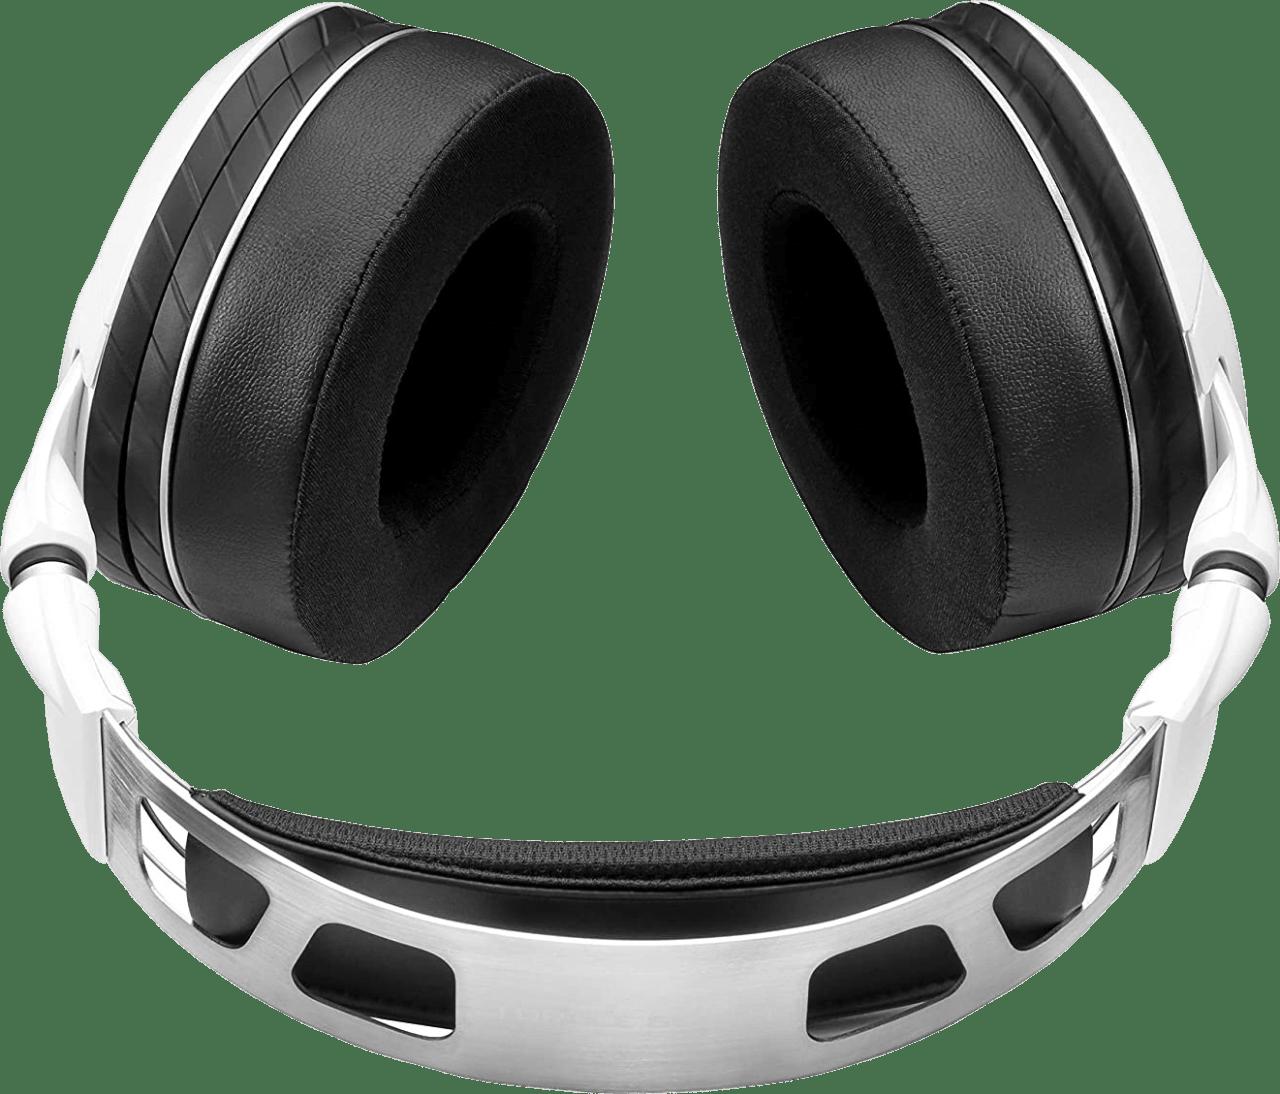 White / Black Turtle Beach Elite Pro 2 + SuperAmp (Xbox) Over-ear Gaming Headphones.3